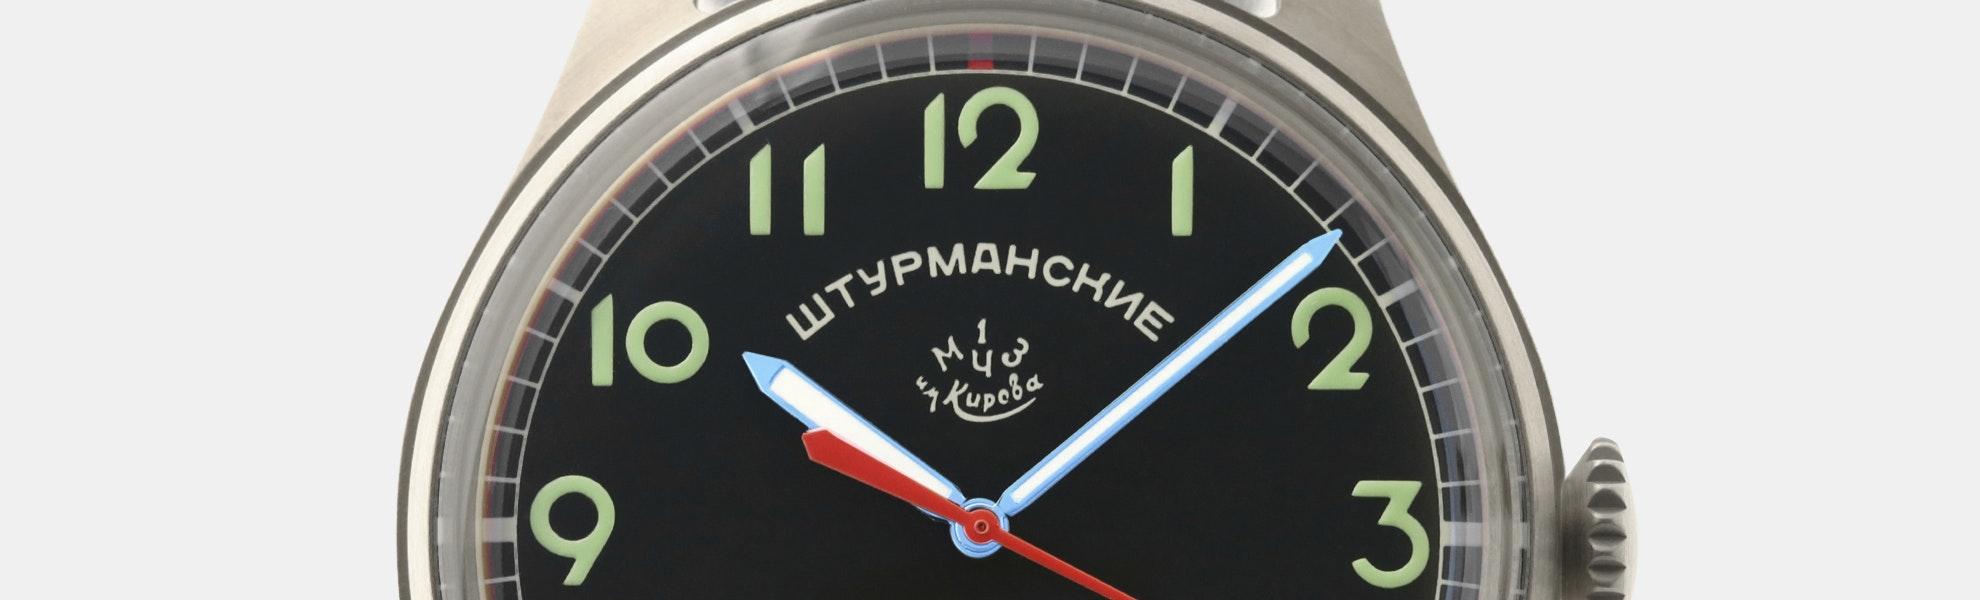 Sturmanskie Gagarin Commemorative Mechanical Watch